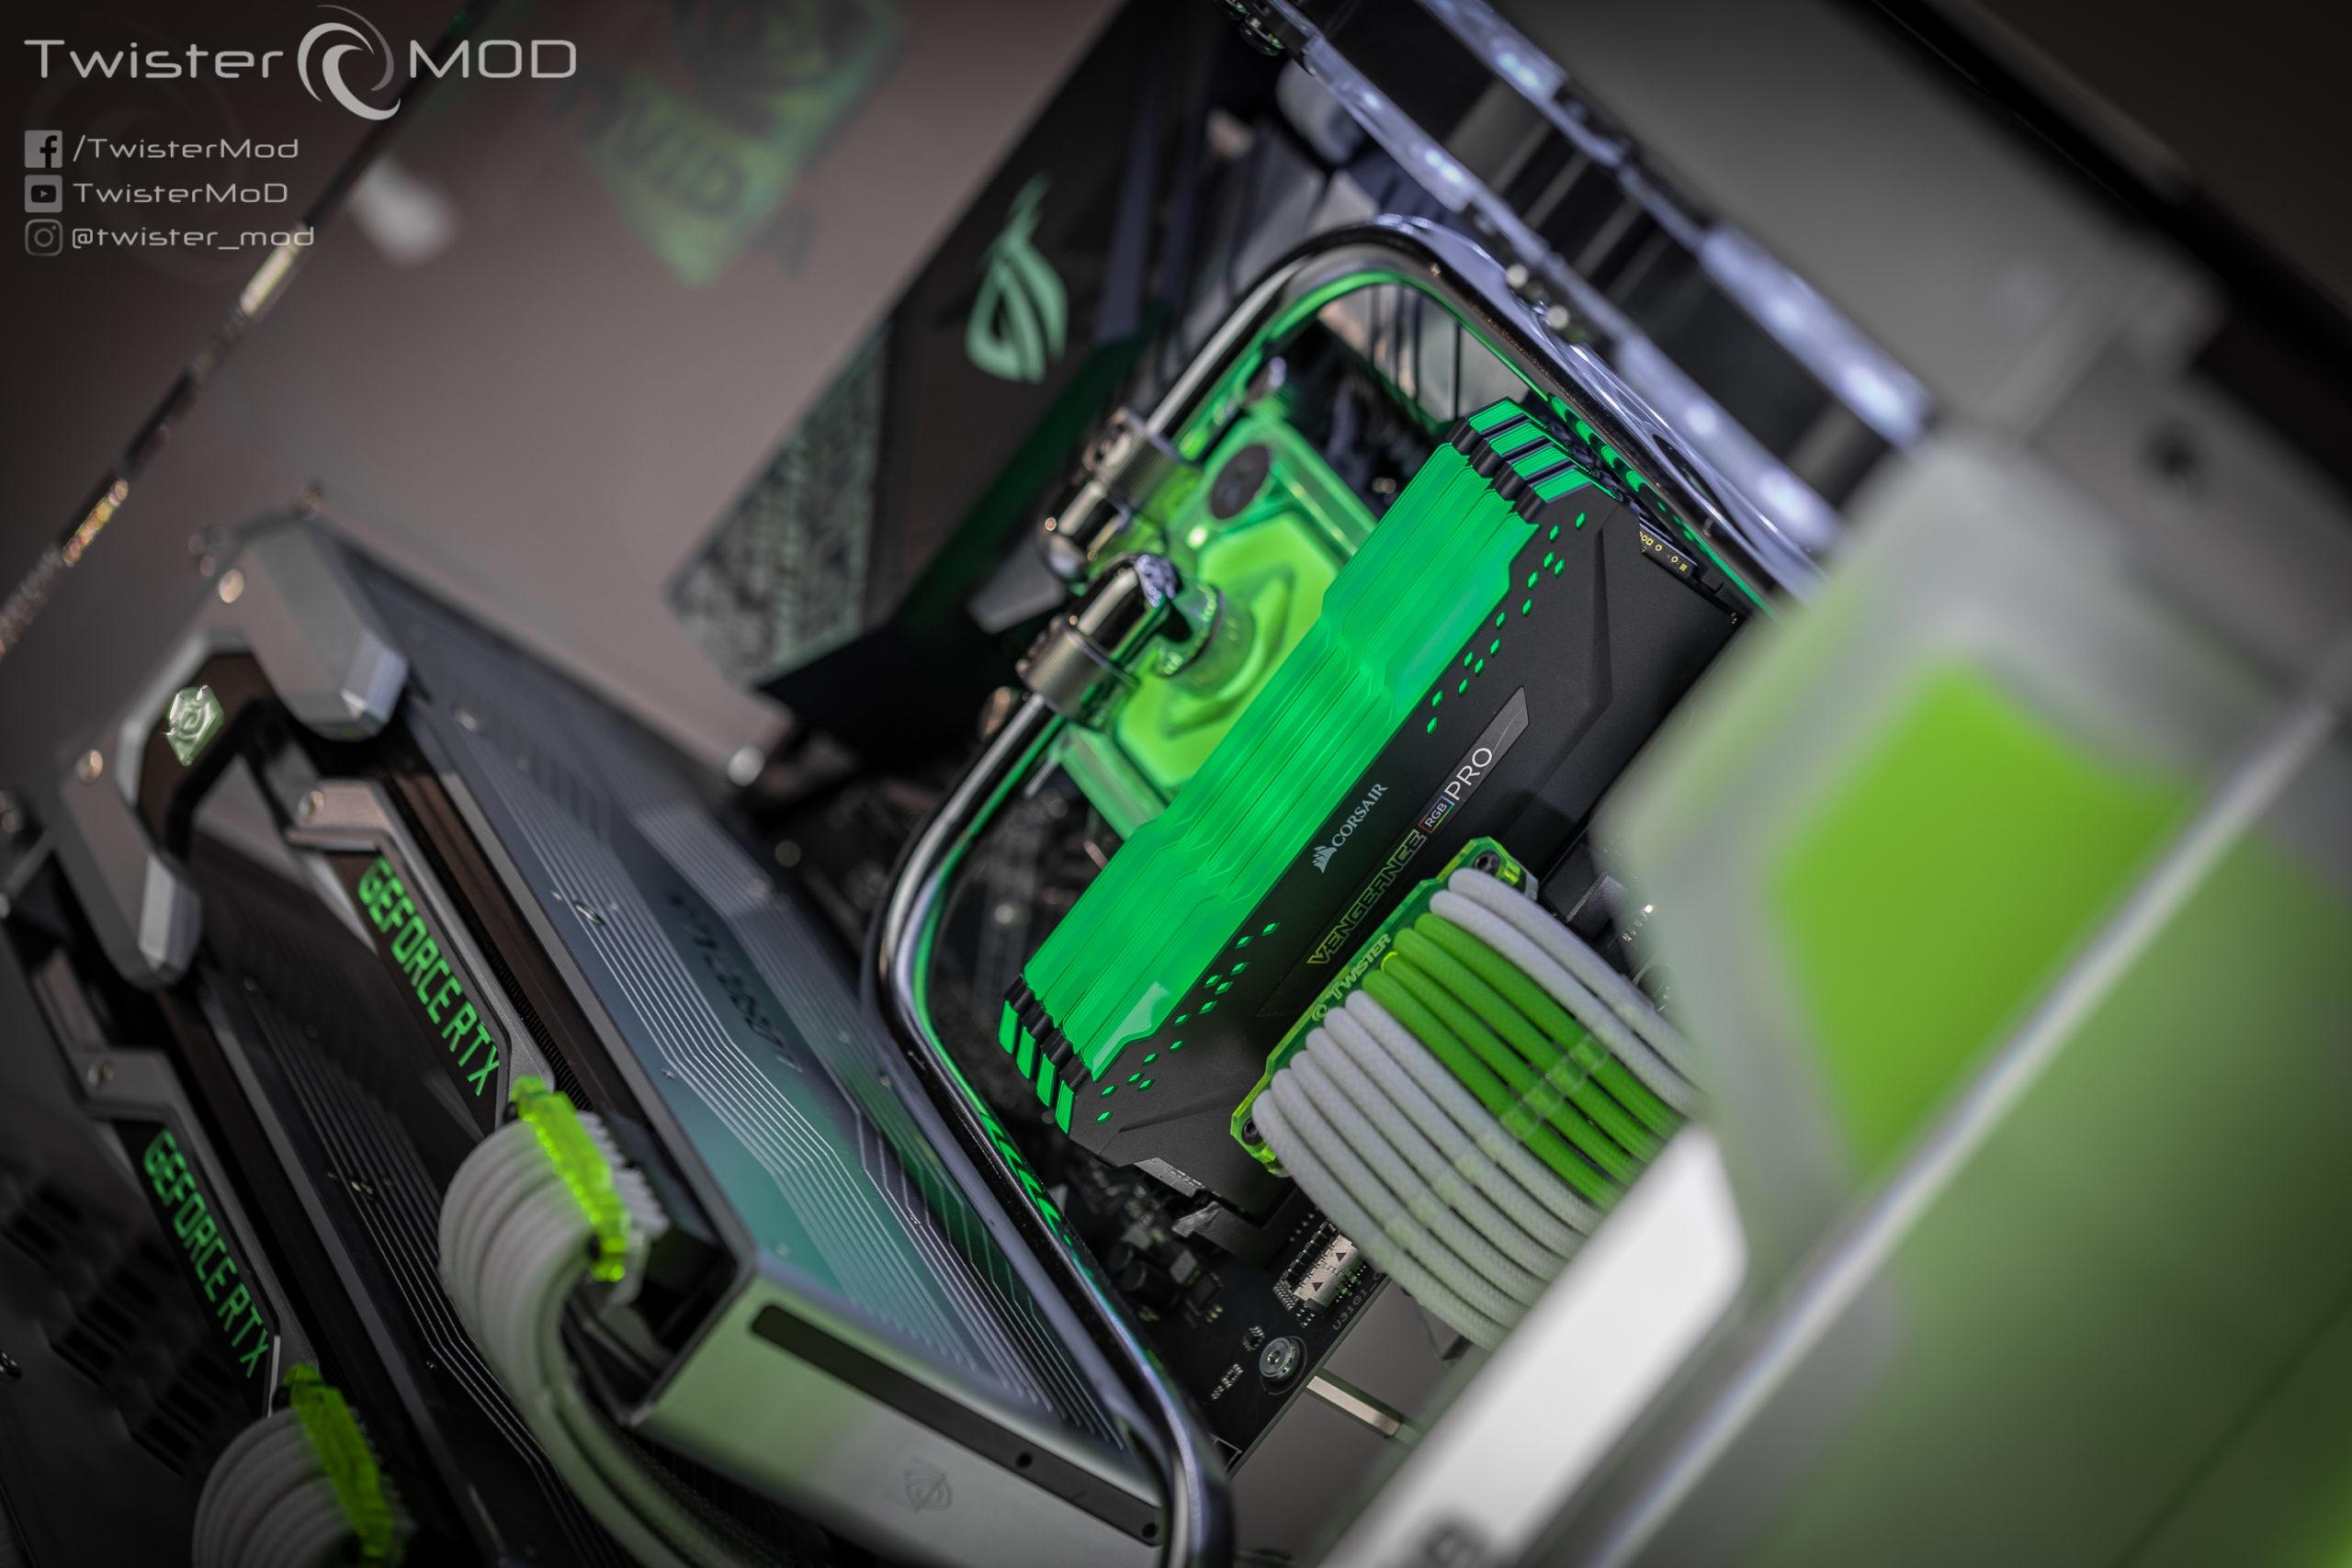 Twistermod_Corsair_Nvidia_500D_Radioactive_RTX_23